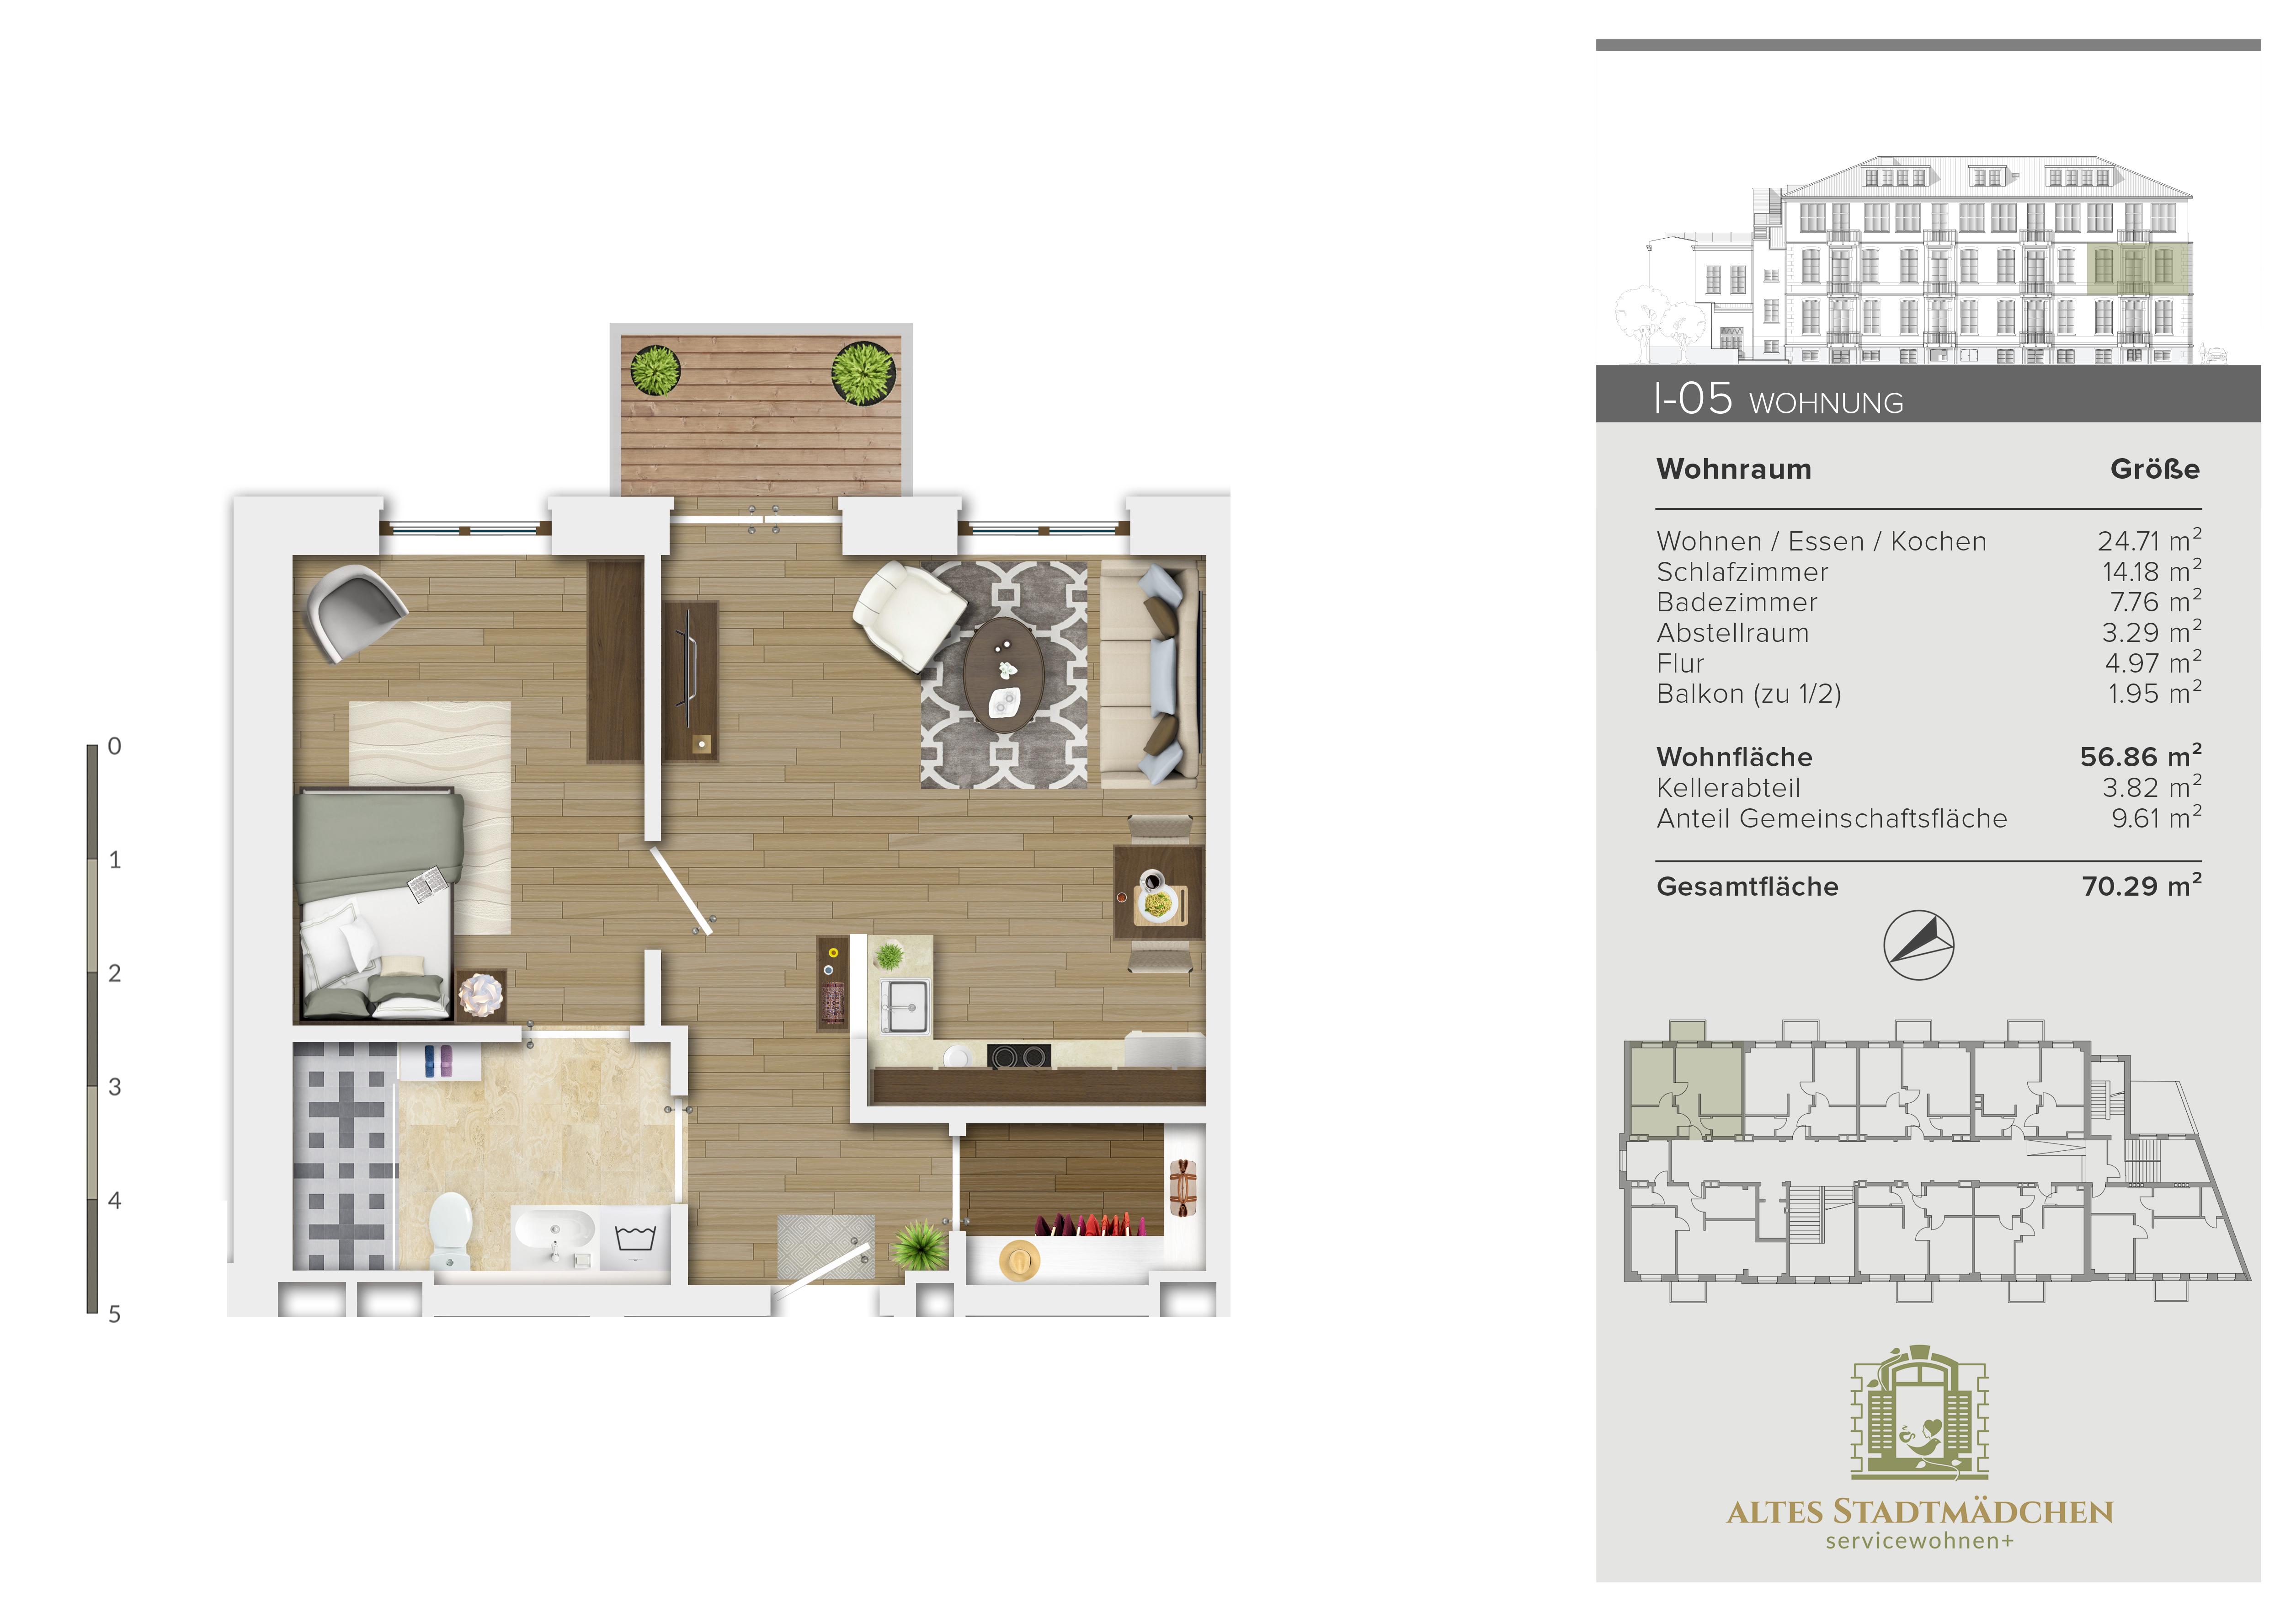 Wohnung I-05